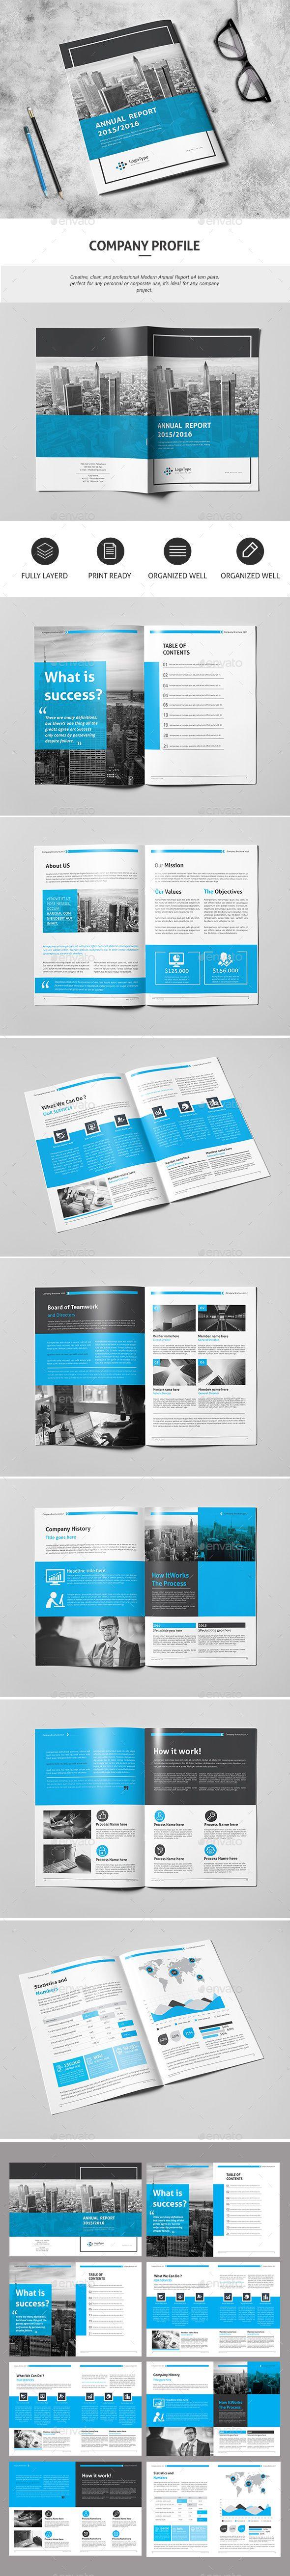 Annual Report   Pinterest